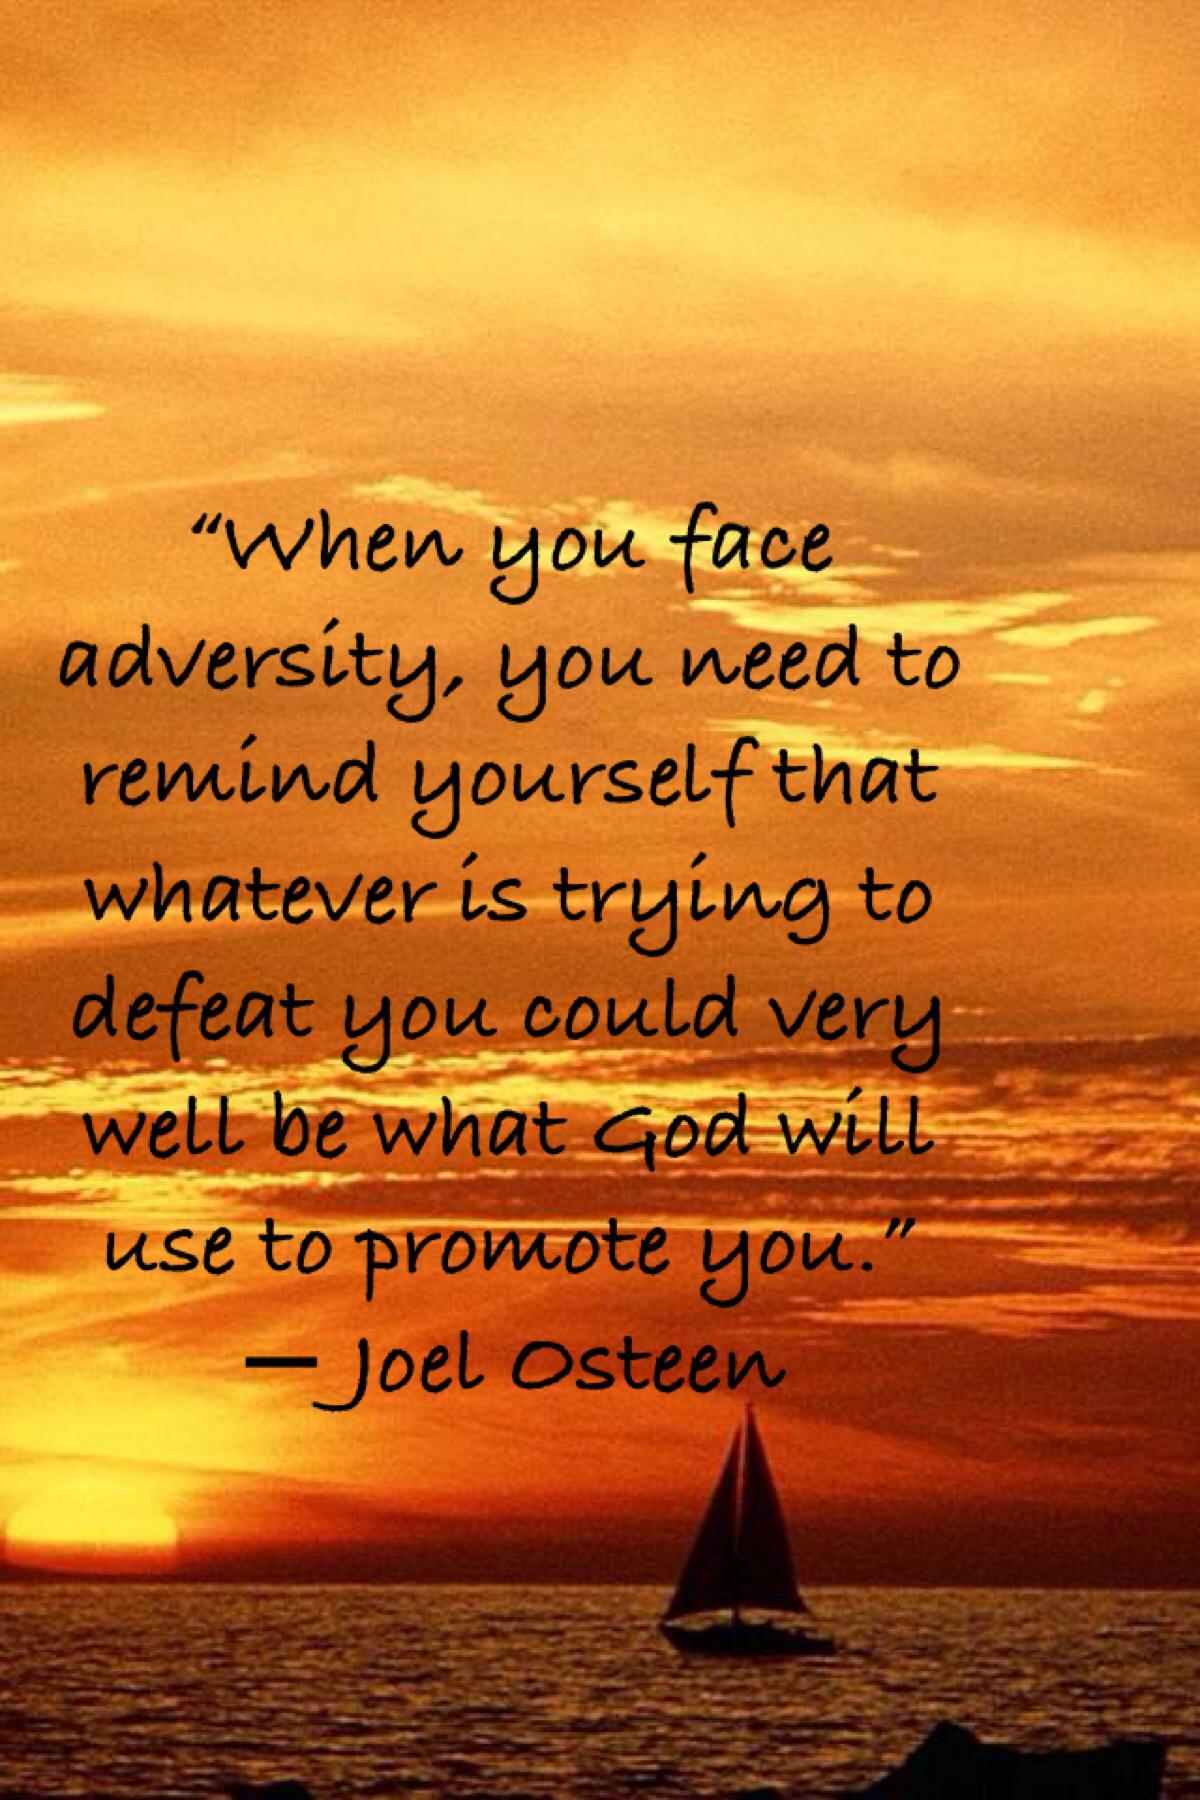 Joel Osteen Quotes Strength  Quotesgram